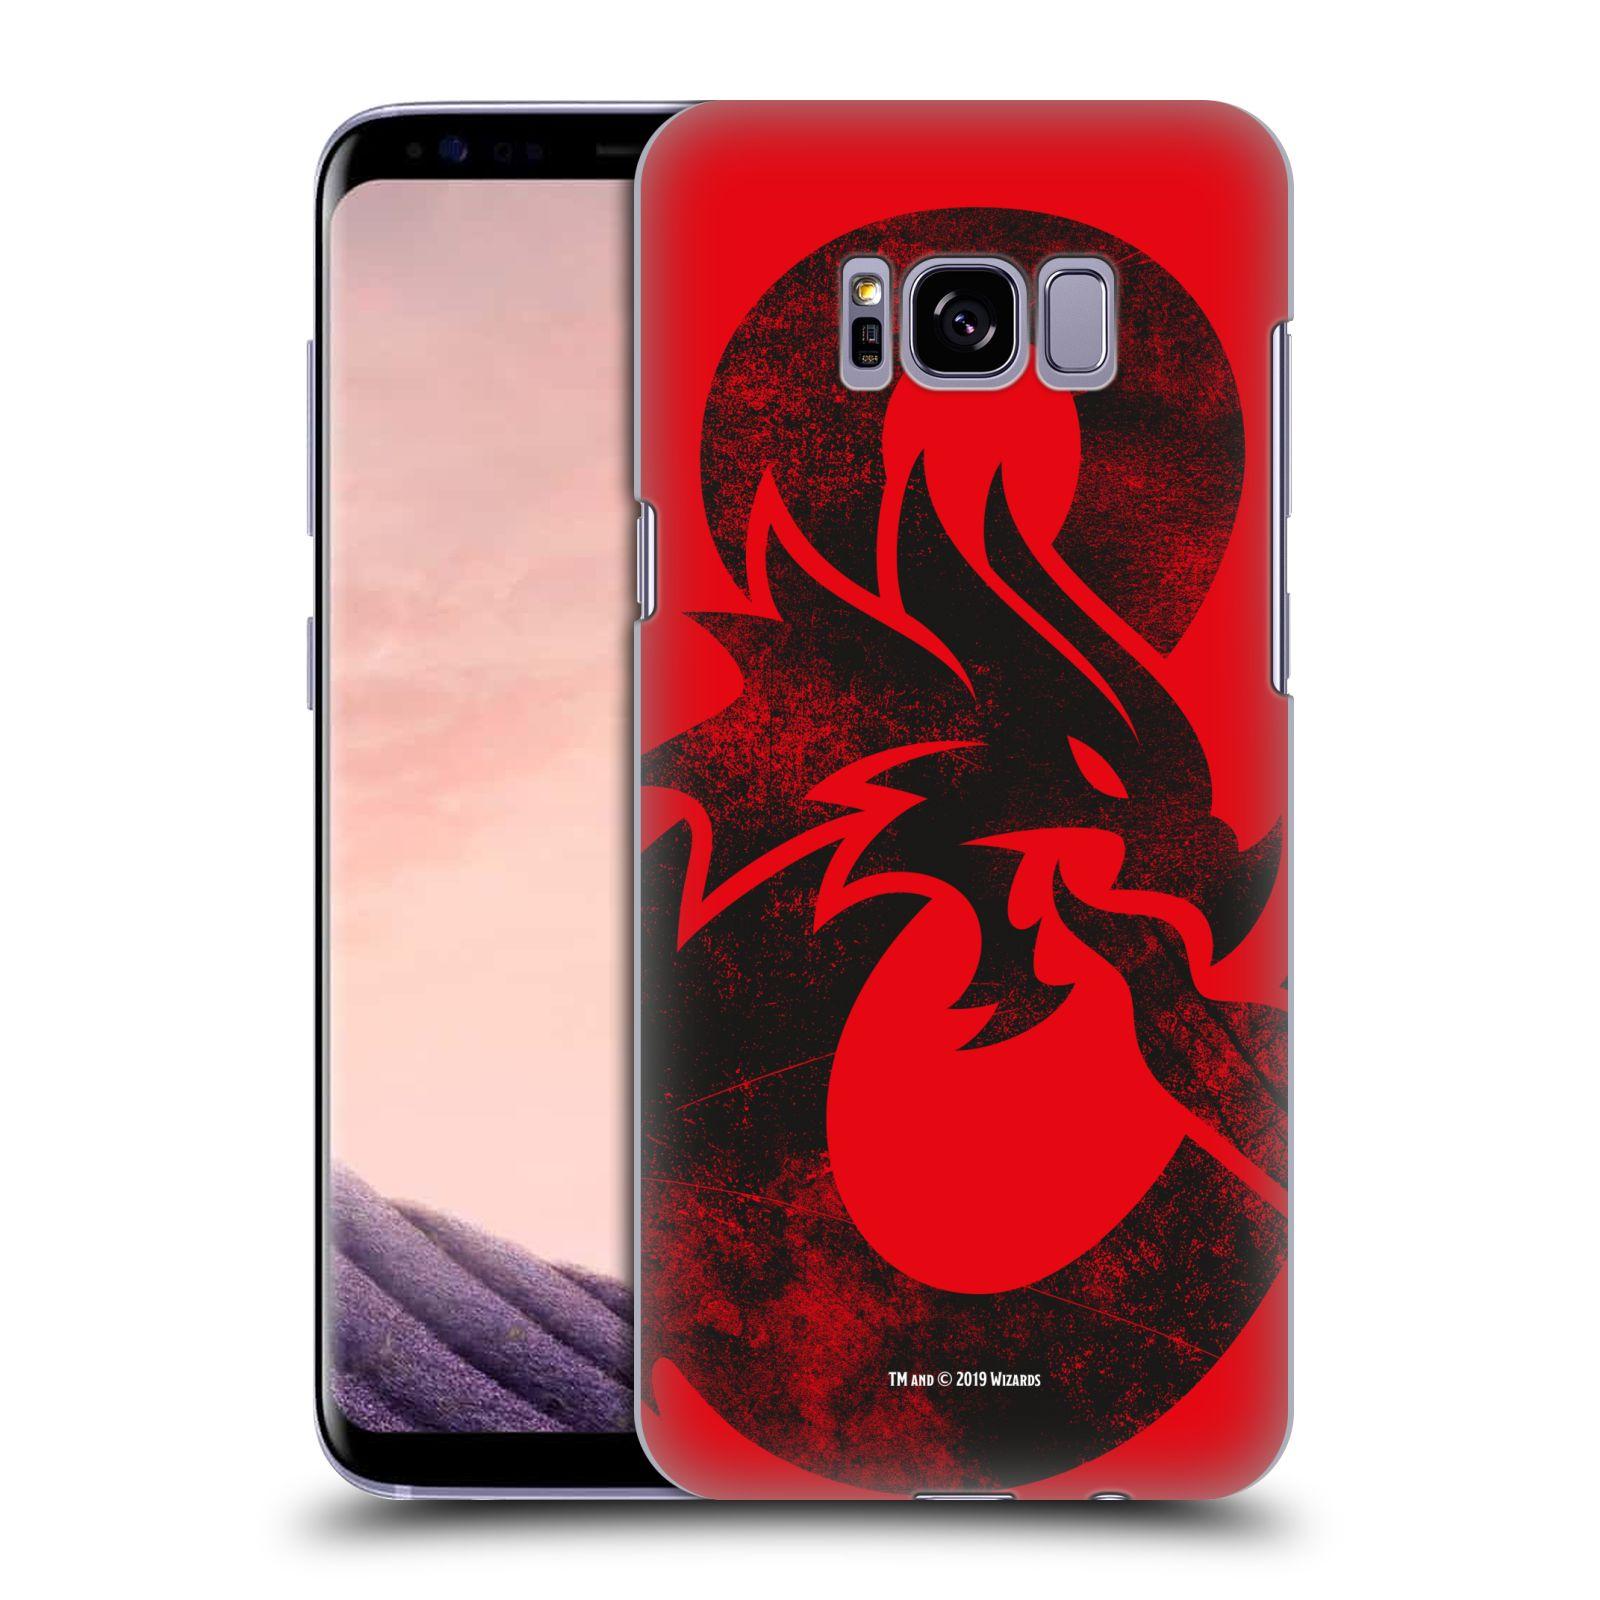 Pouzdro na mobil Samsung Galaxy S8 PLUS - HEAD CASE - Dungeons and Dragons - Chrlící drak